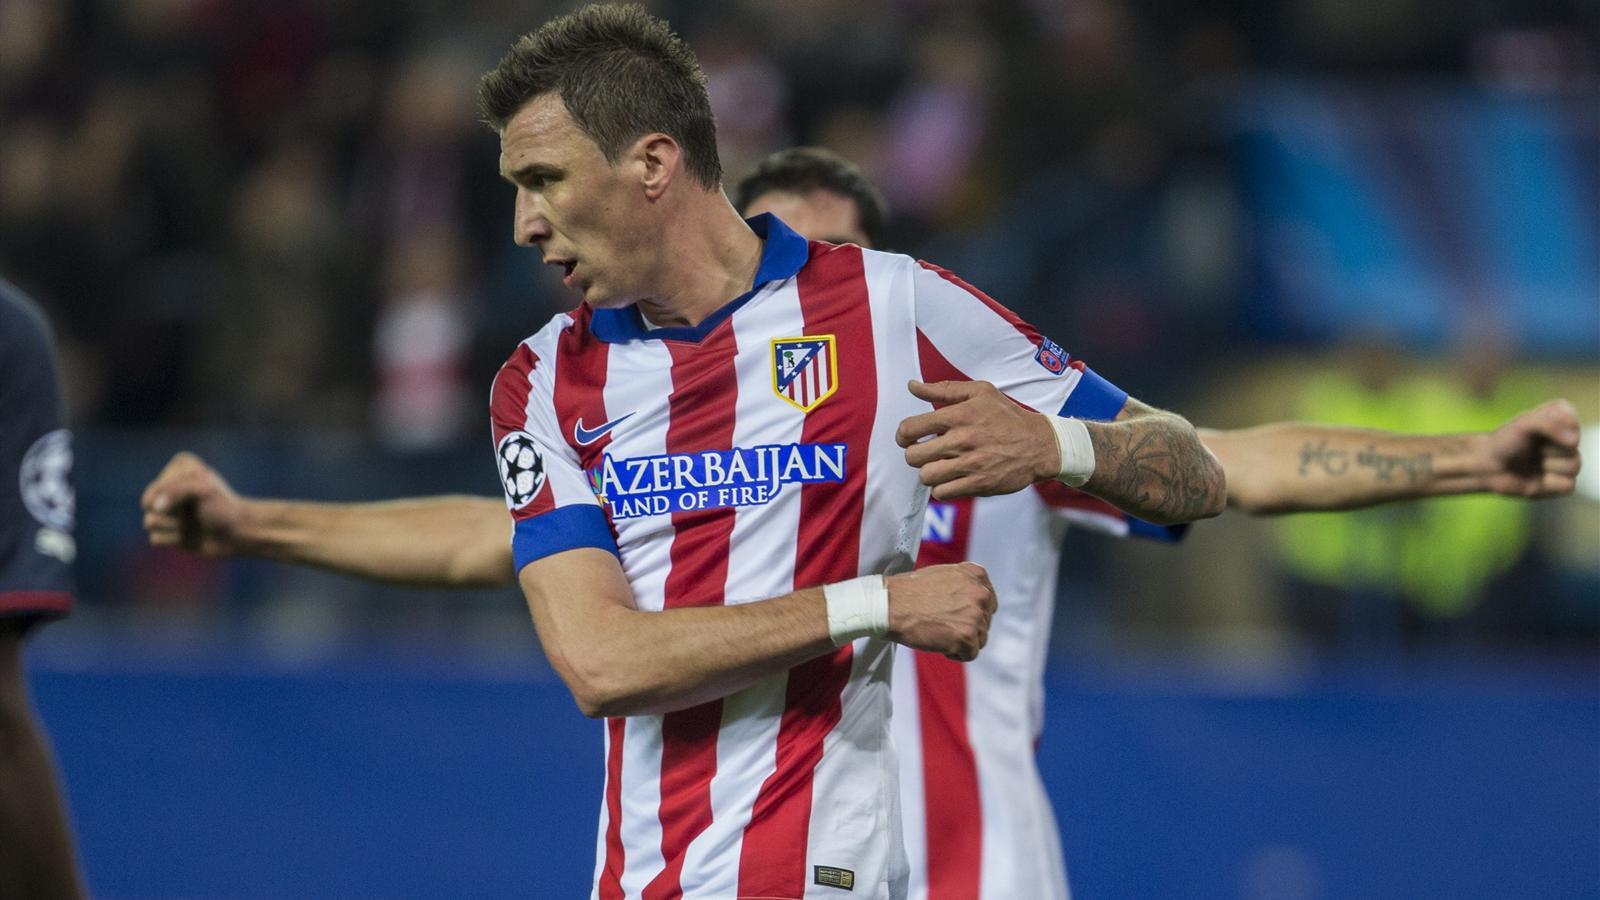 Atlético 4-0 Olympiakos : Avec Mandzukic, l'Atlético ne s'est pas trompé de pointure